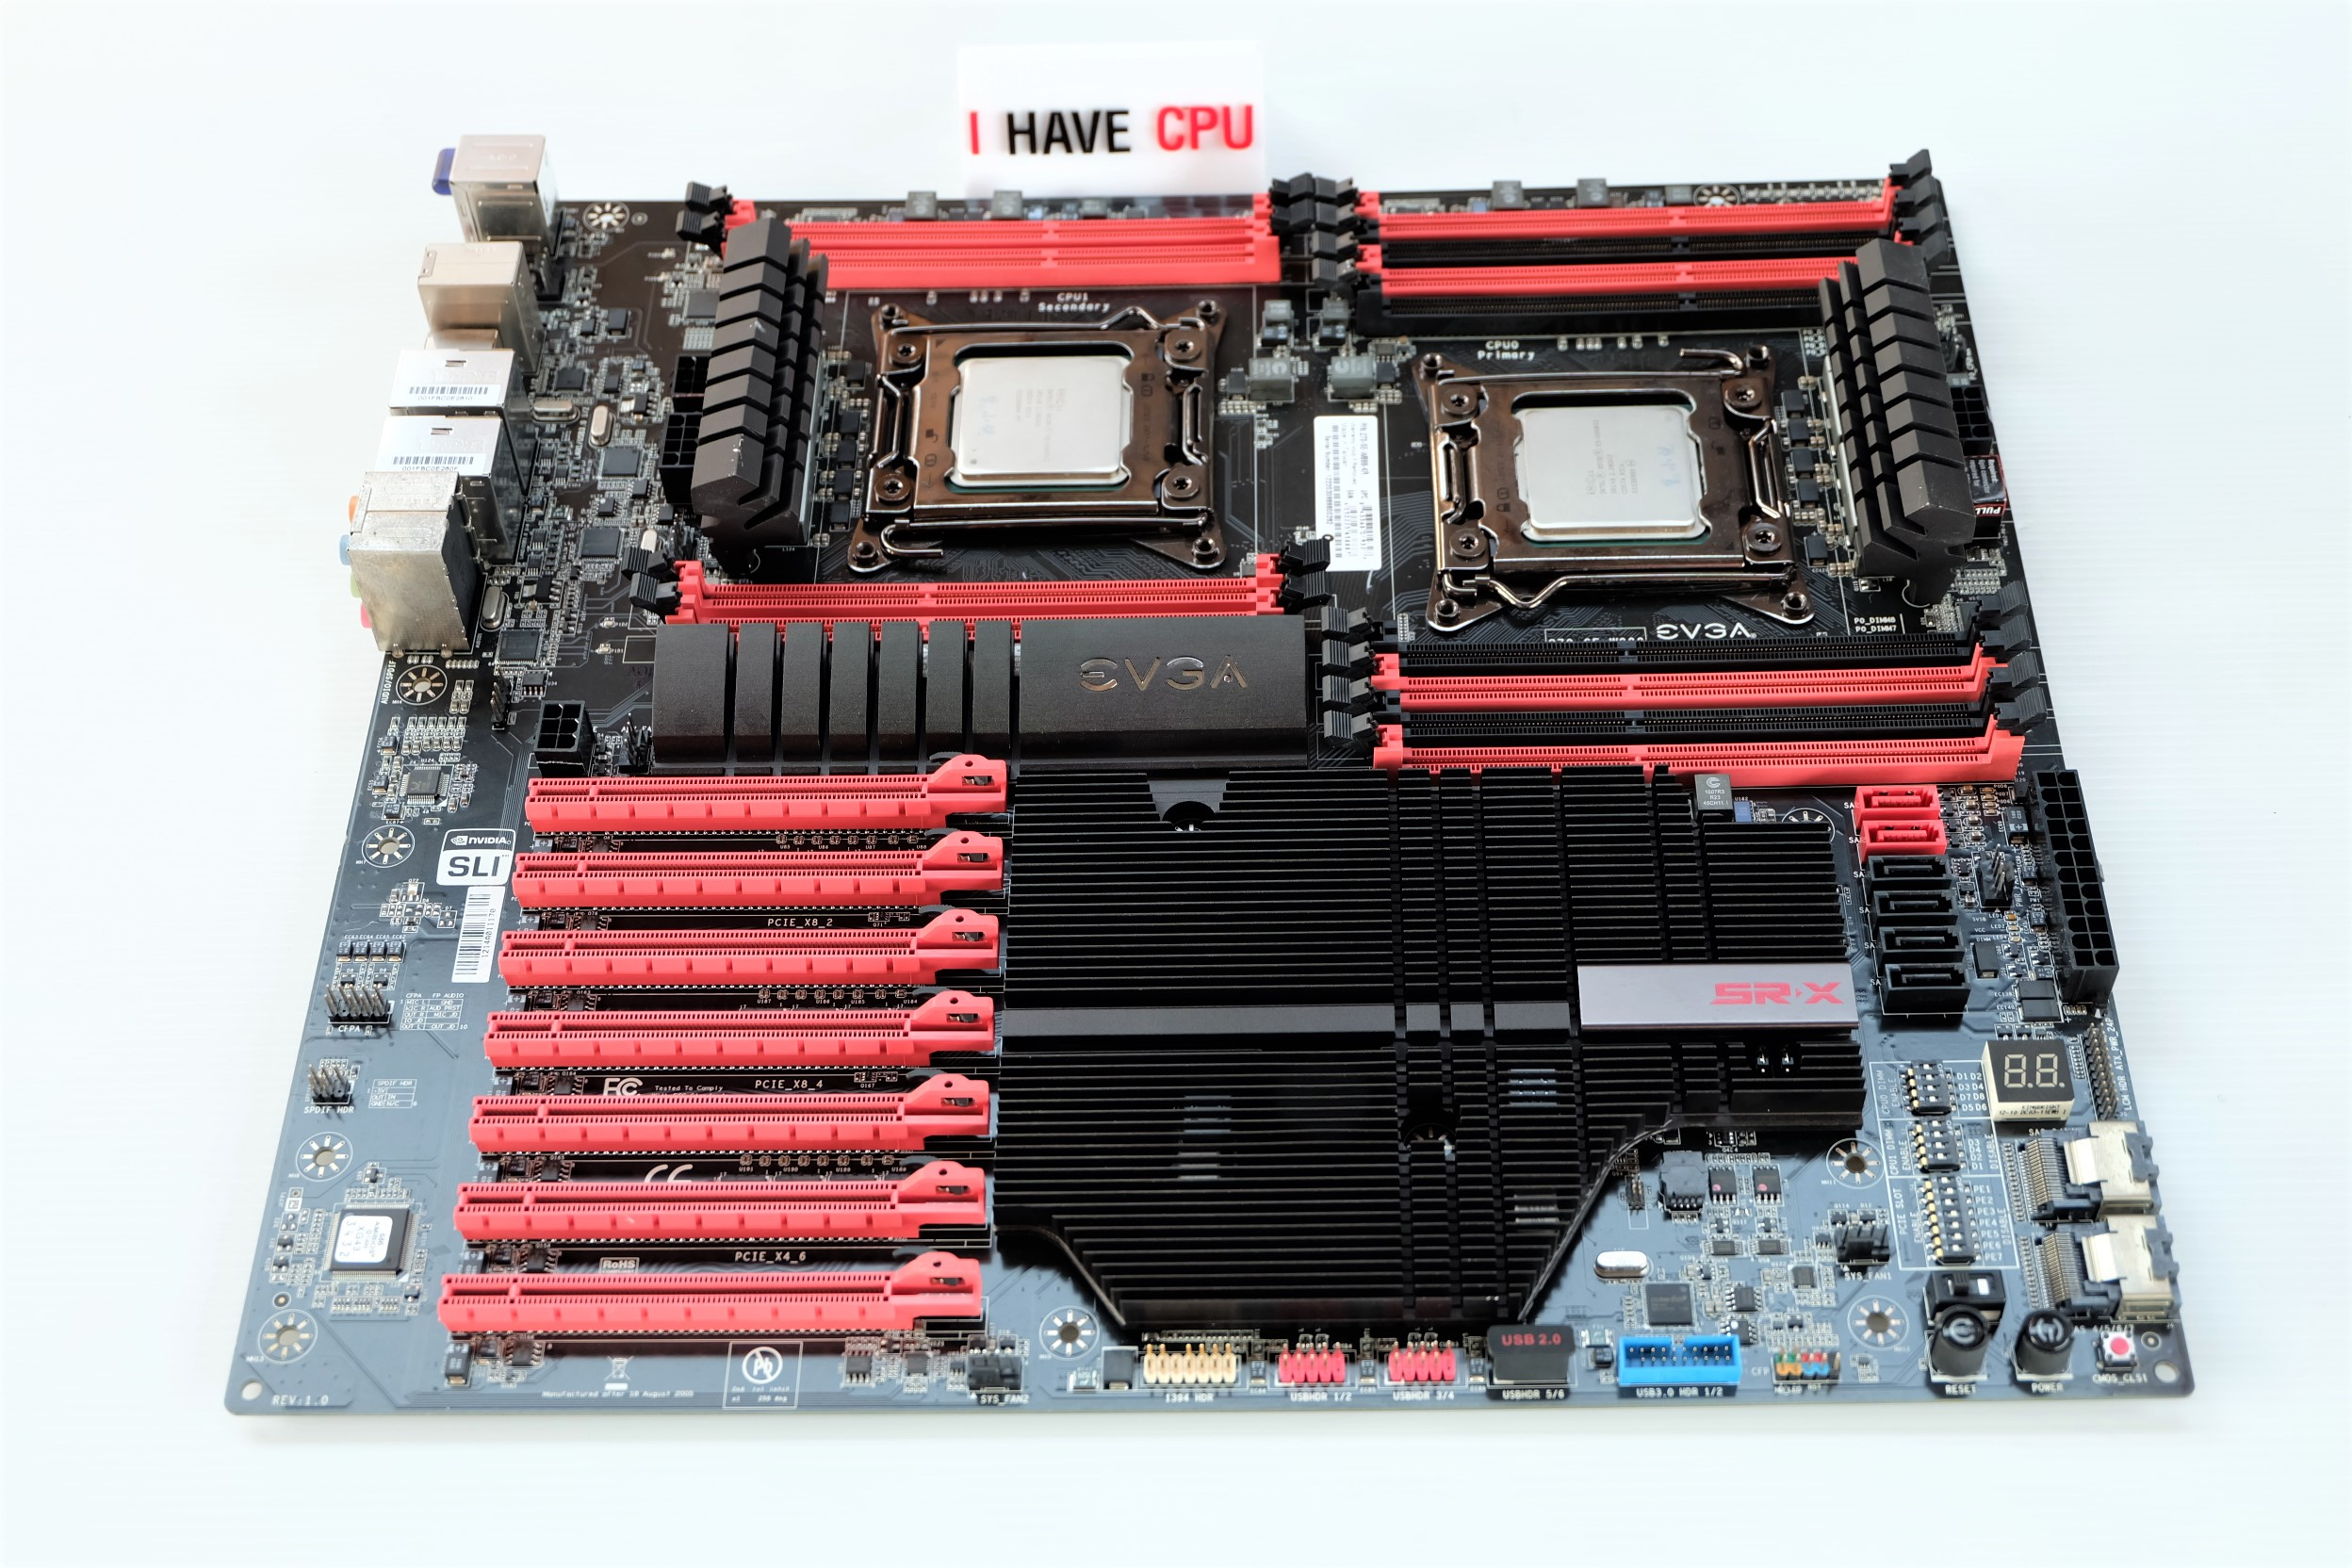 Workstaton 20 Core 40 Thread, MB EVGA SR-X, RAM 32GB